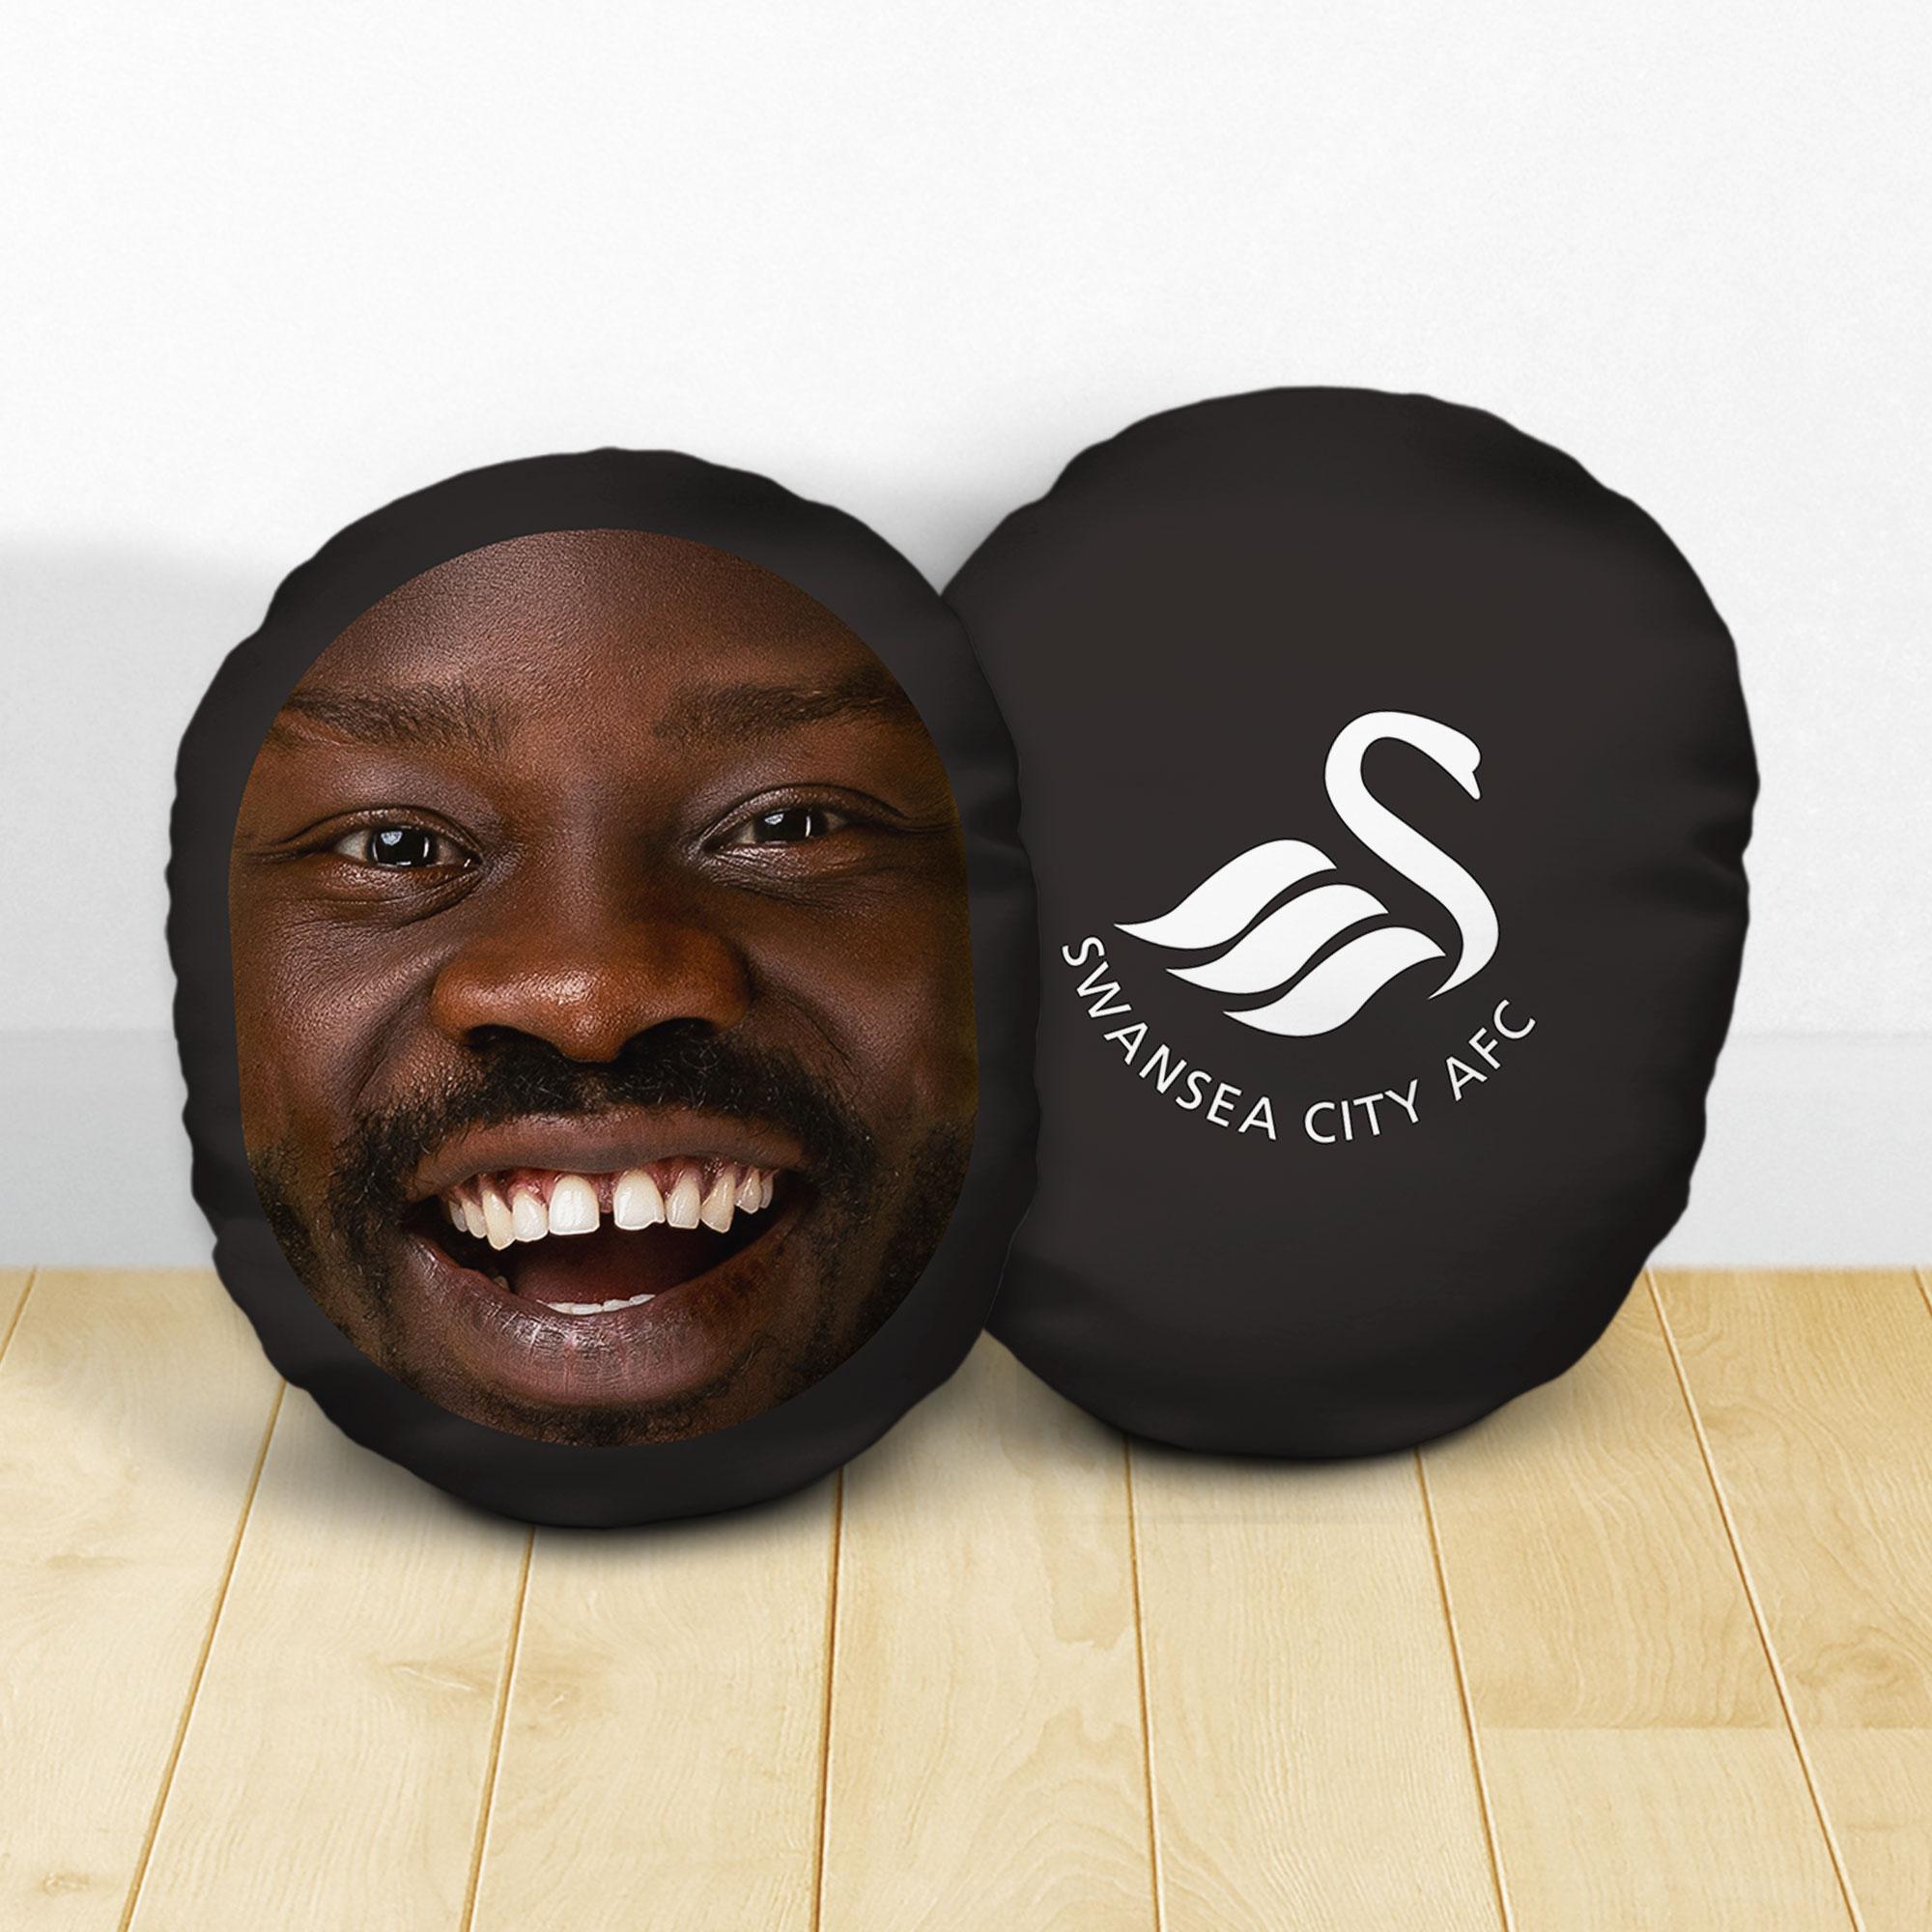 Personalised Swansea City AFC Crest Mush Cush